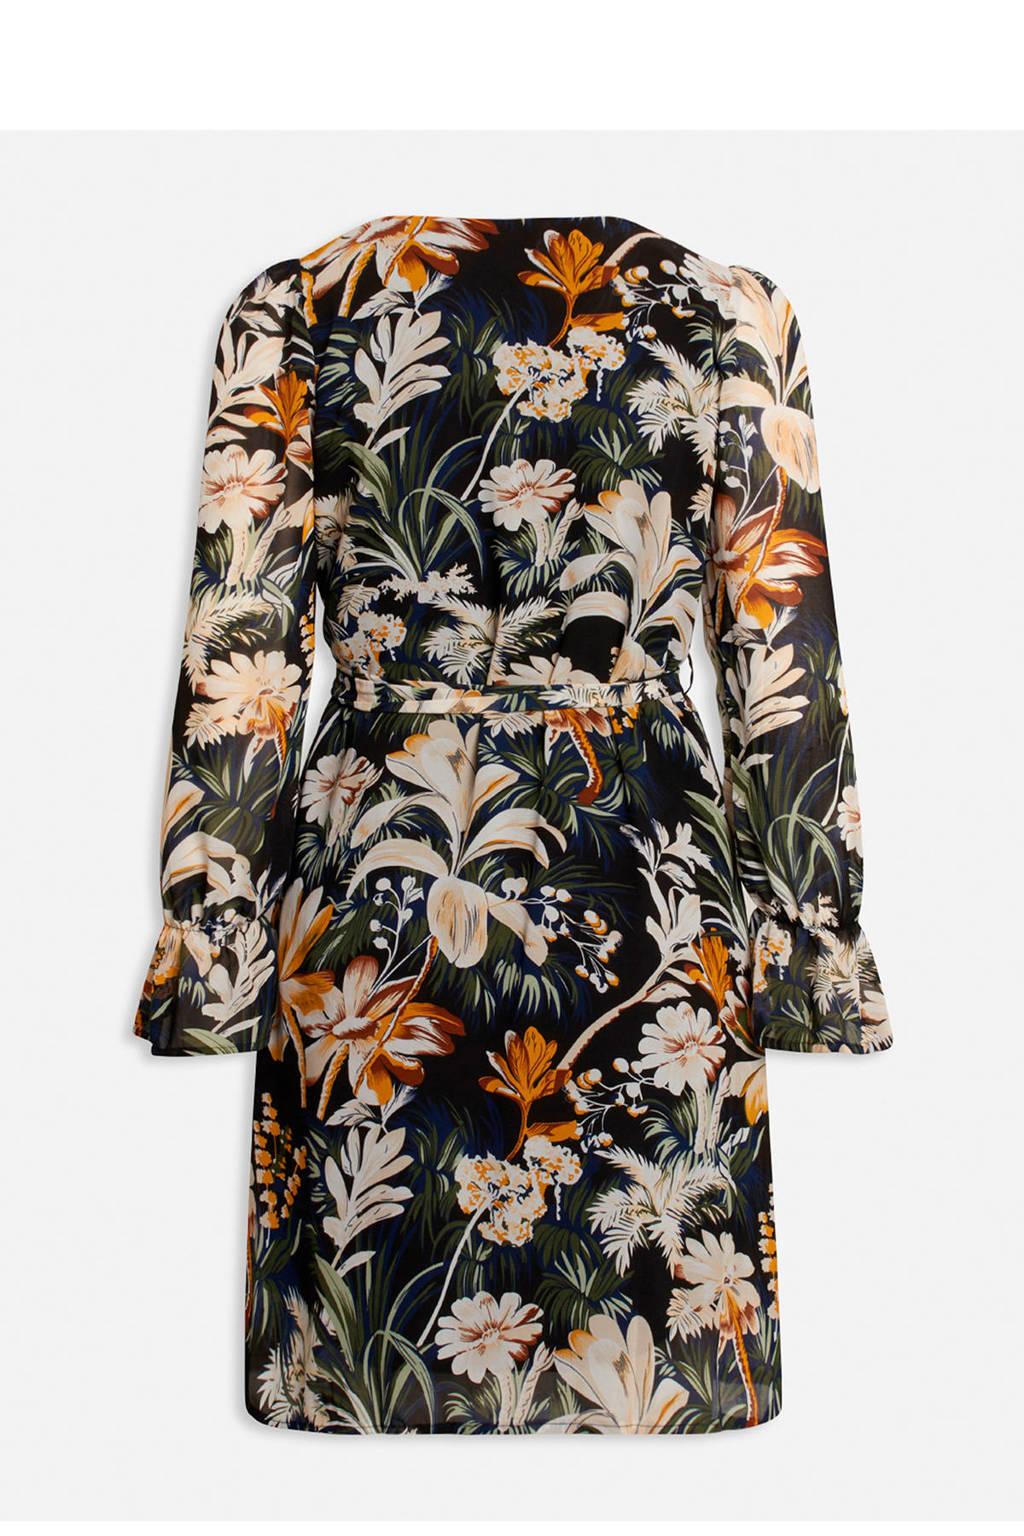 SisterS Point gebloemde semi-transparante jurk NOKI-DR13 zwart/multi, Zwart/multi